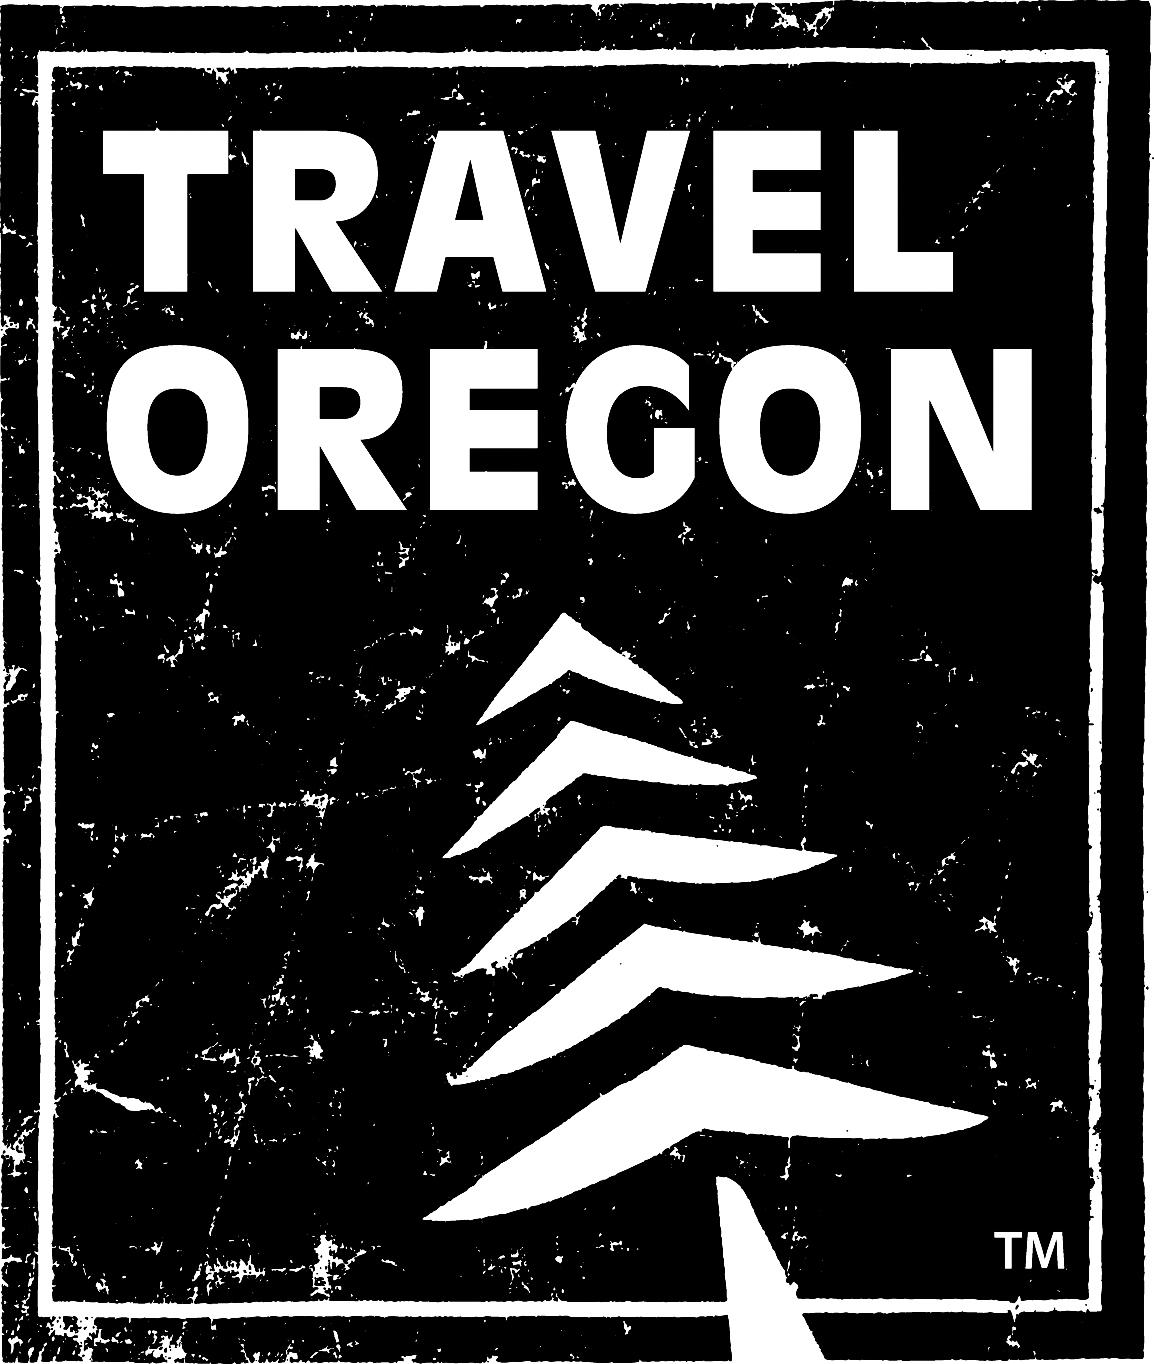 travel_oregon_tm.jpg